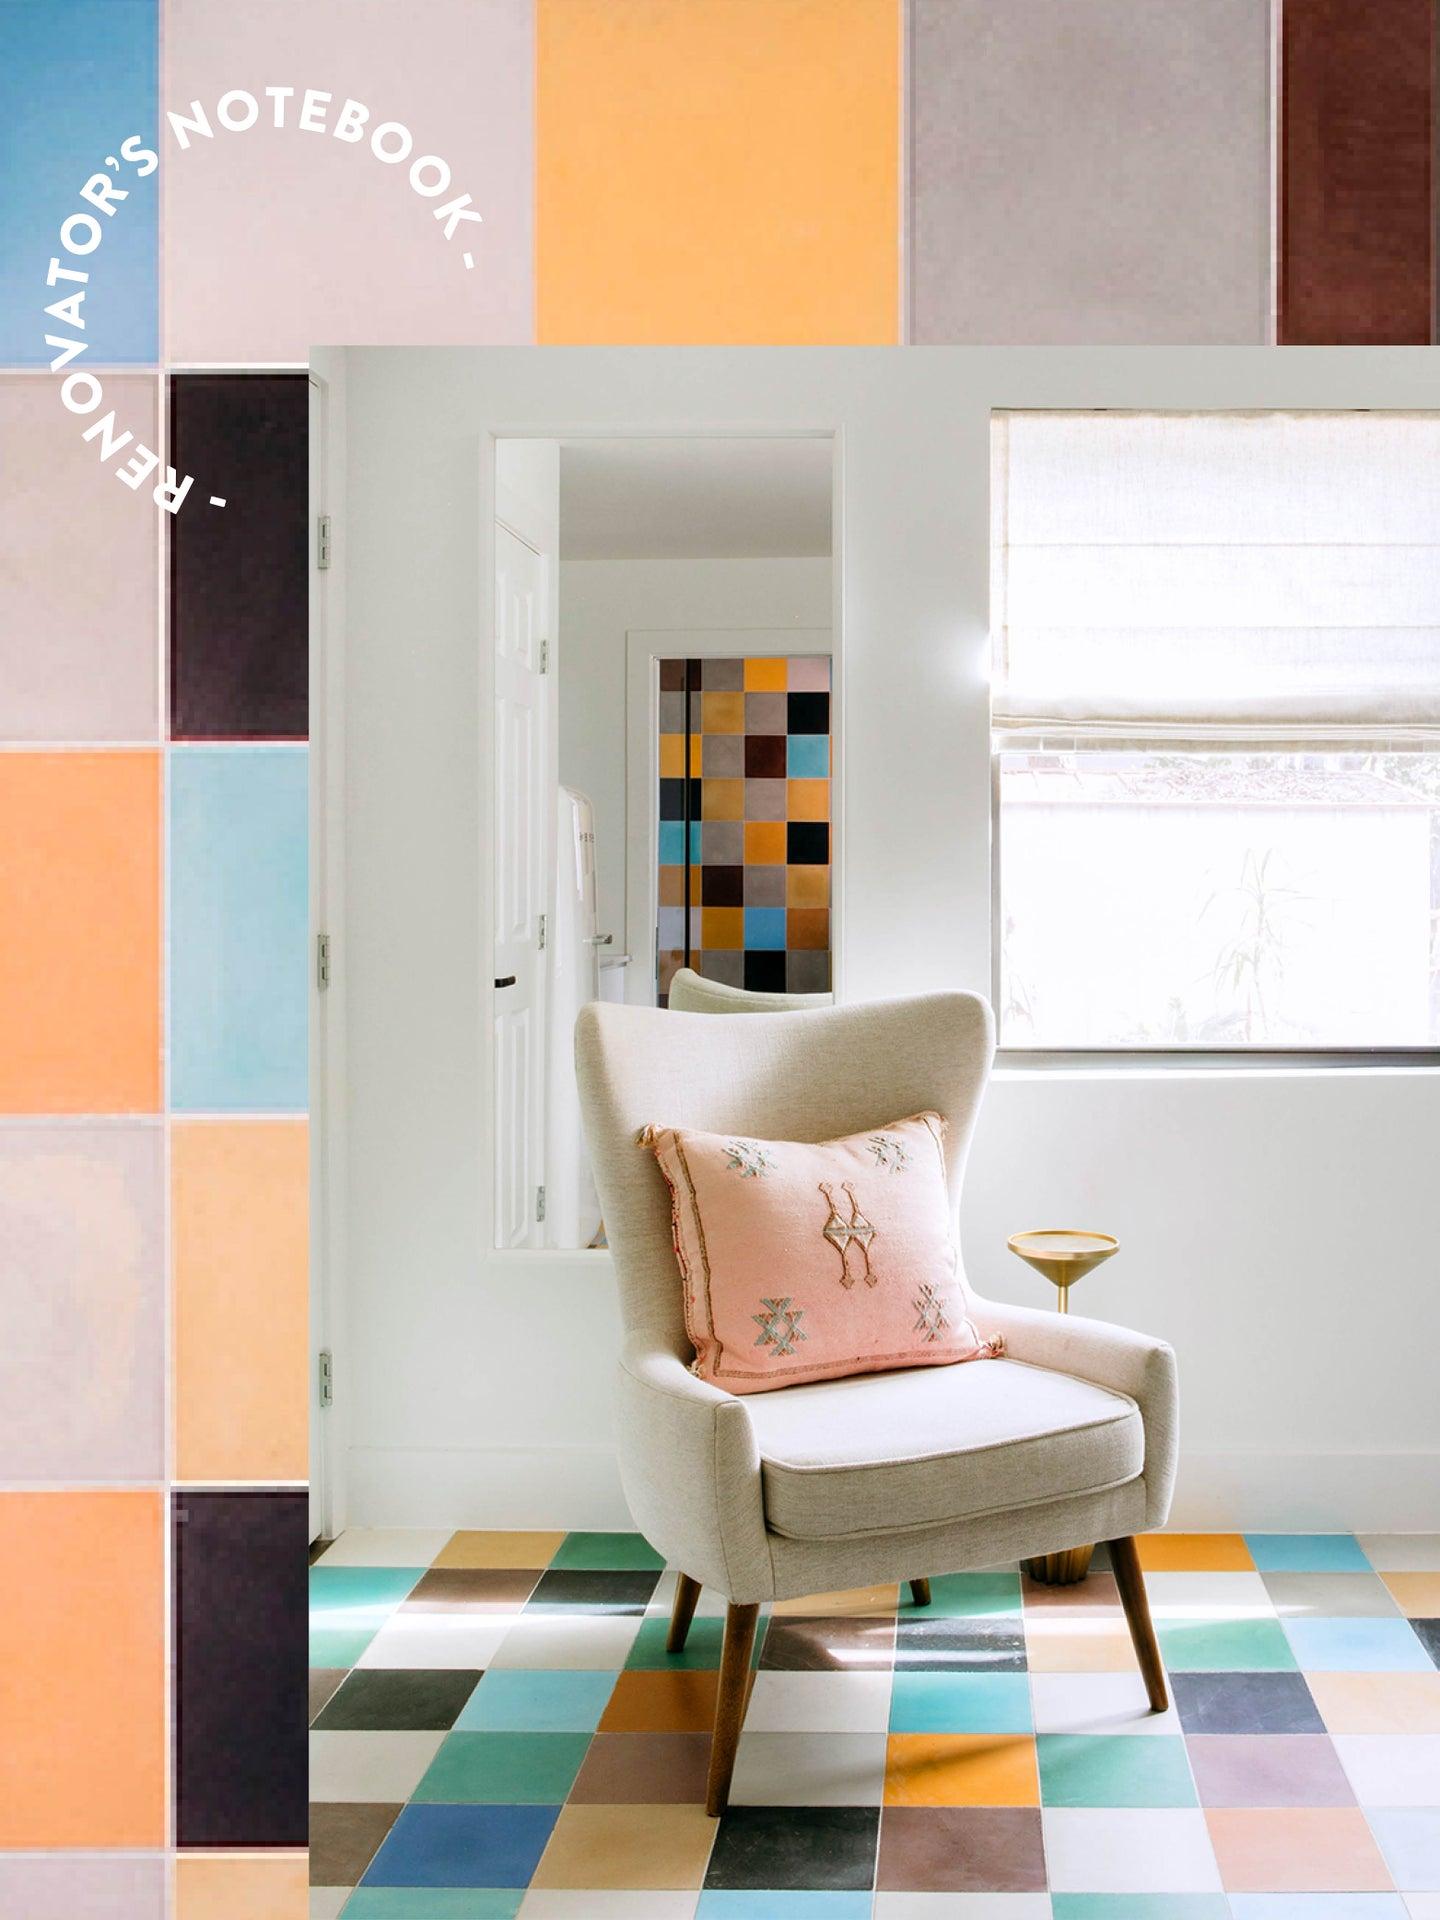 chai r in a corner of tiled bedroom